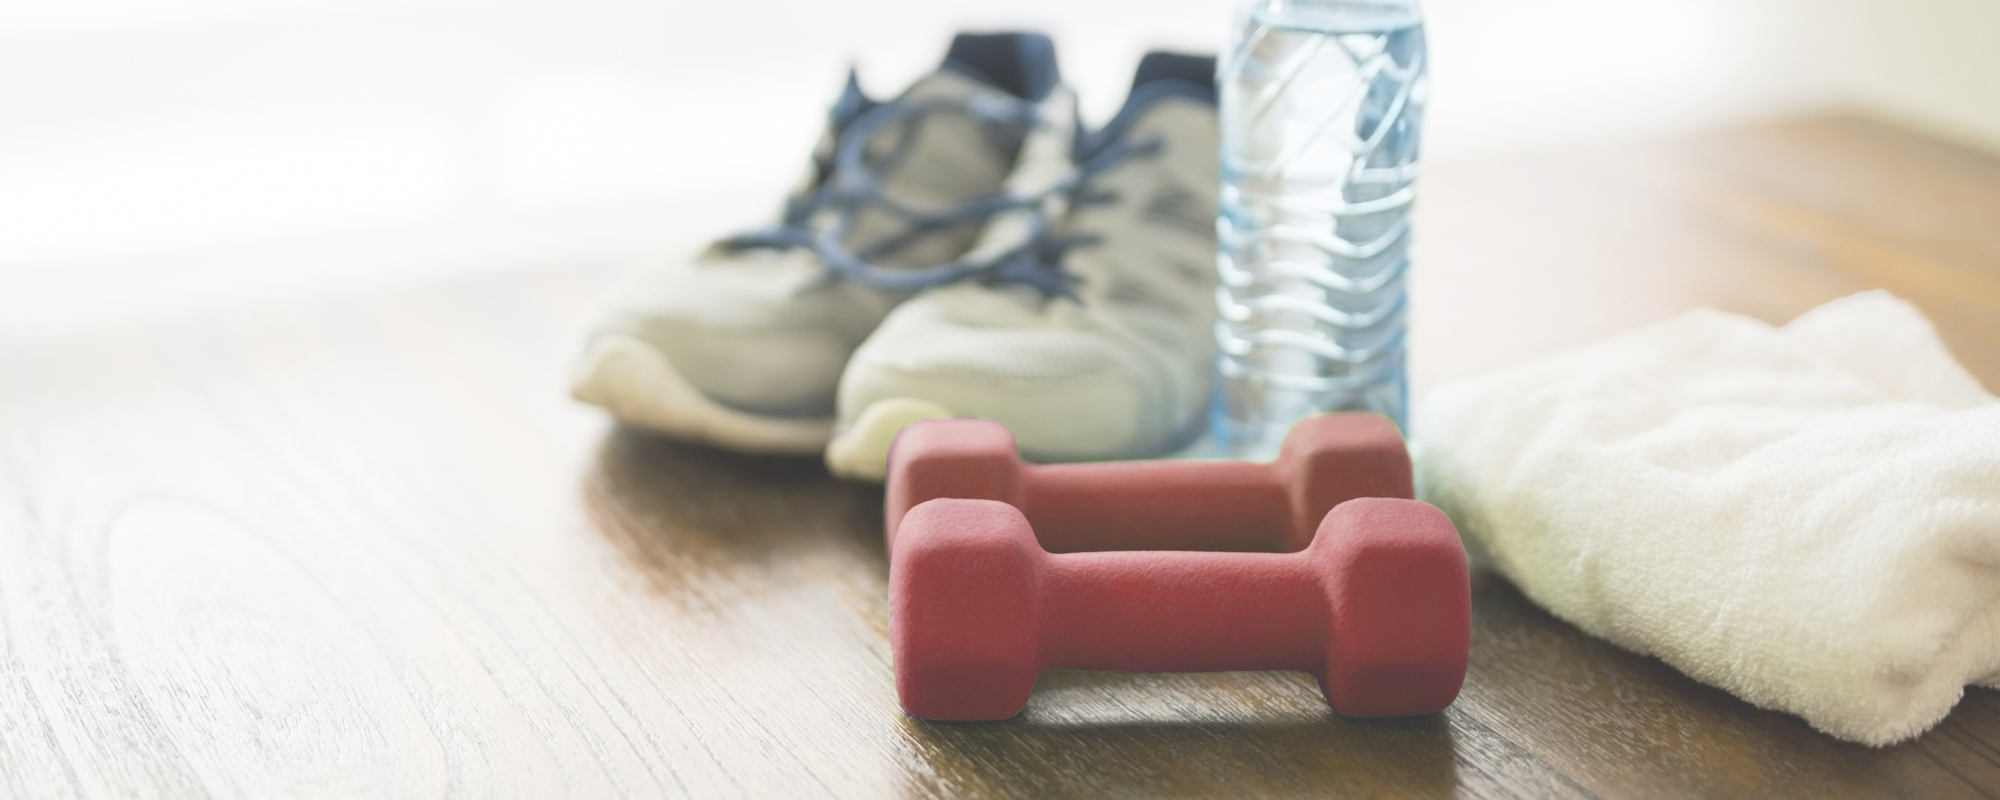 - Health & Fitness